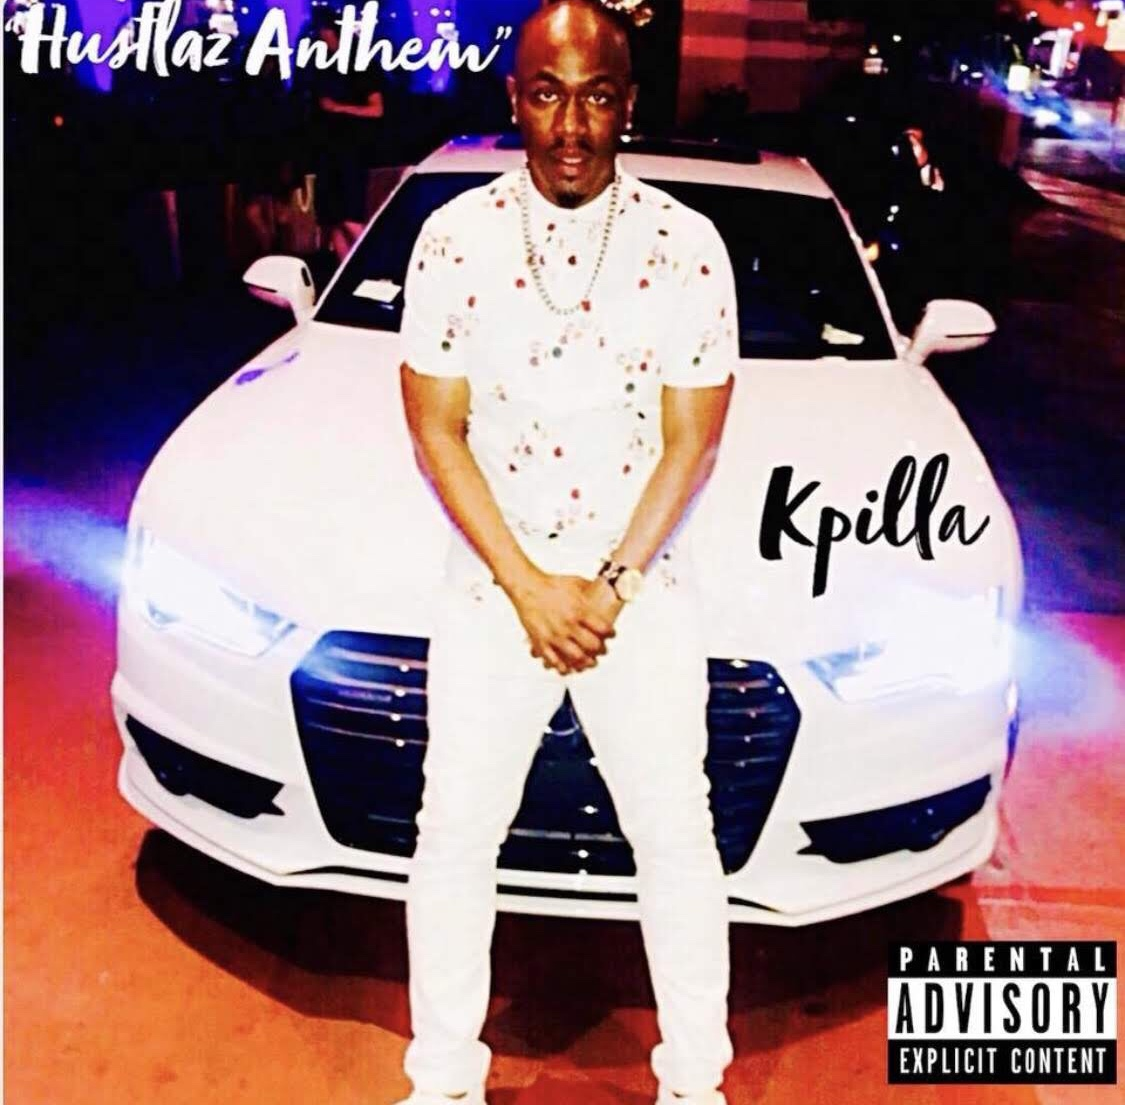 K. Pilla Hustlaz Anthem